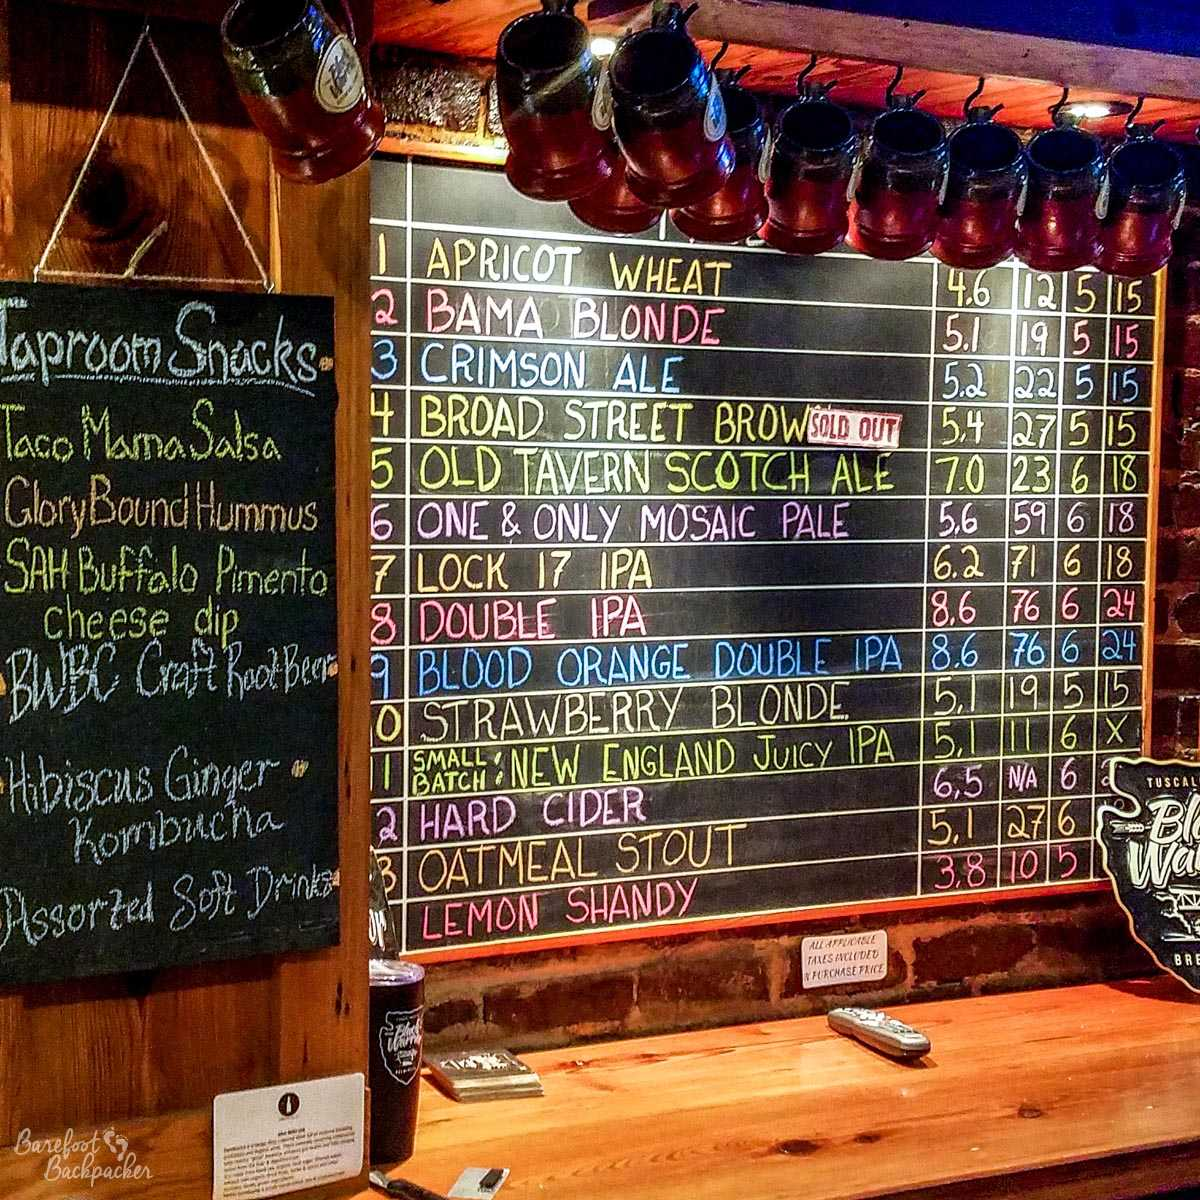 List of beers at Black Warrior Brewery, Tuscaloosa AL